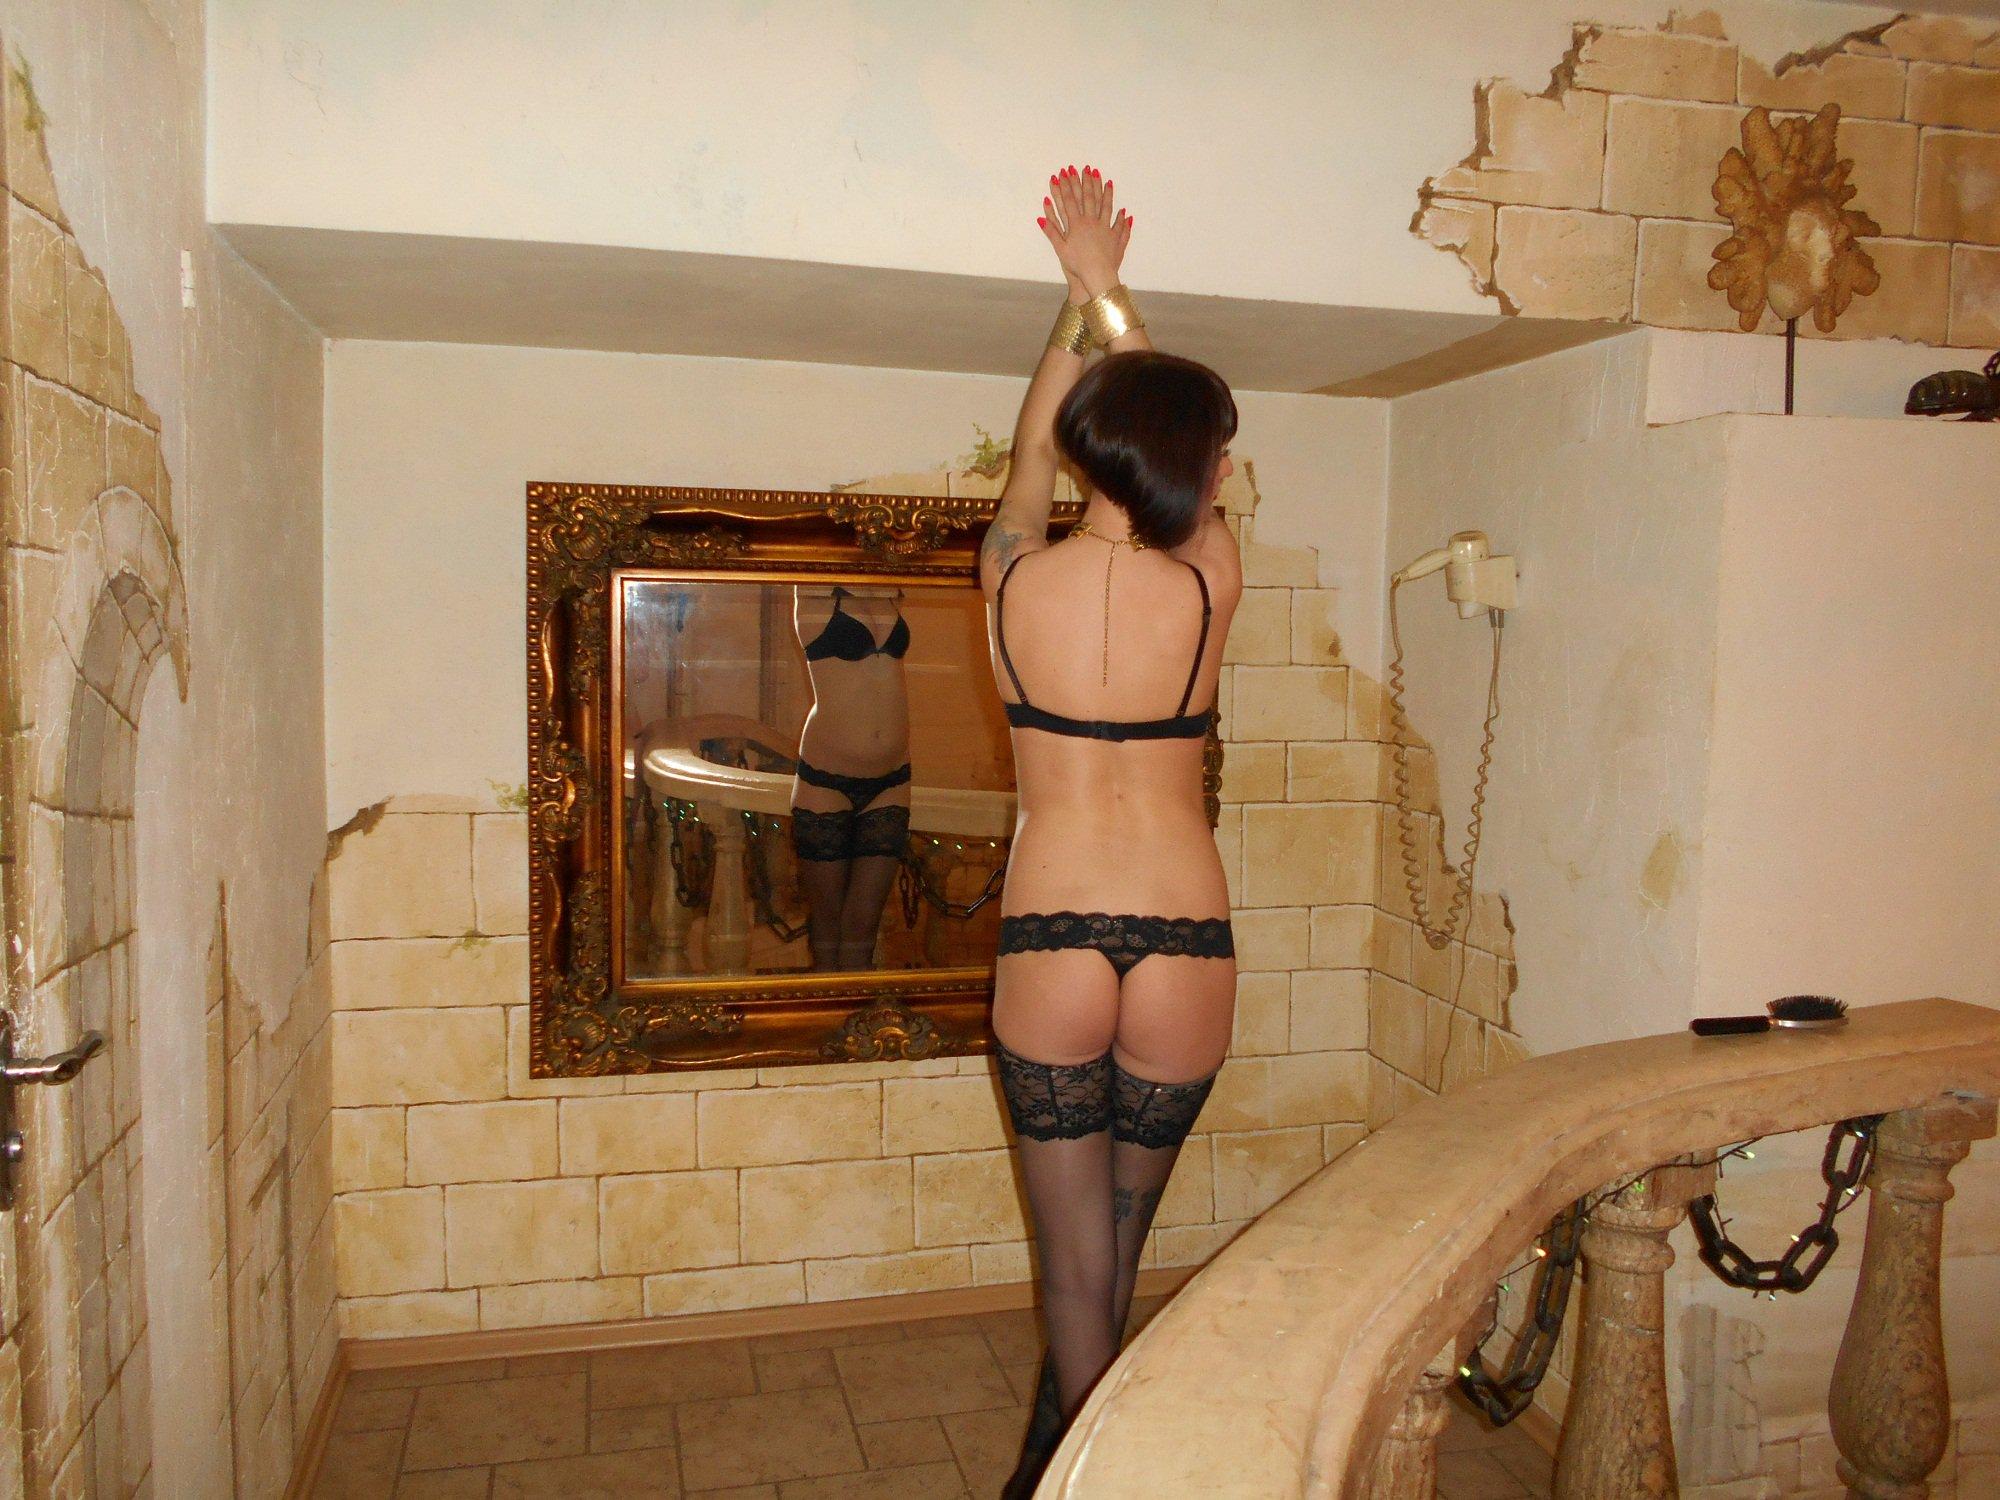 Снять проститутку виктория, Array, у метро , в районе